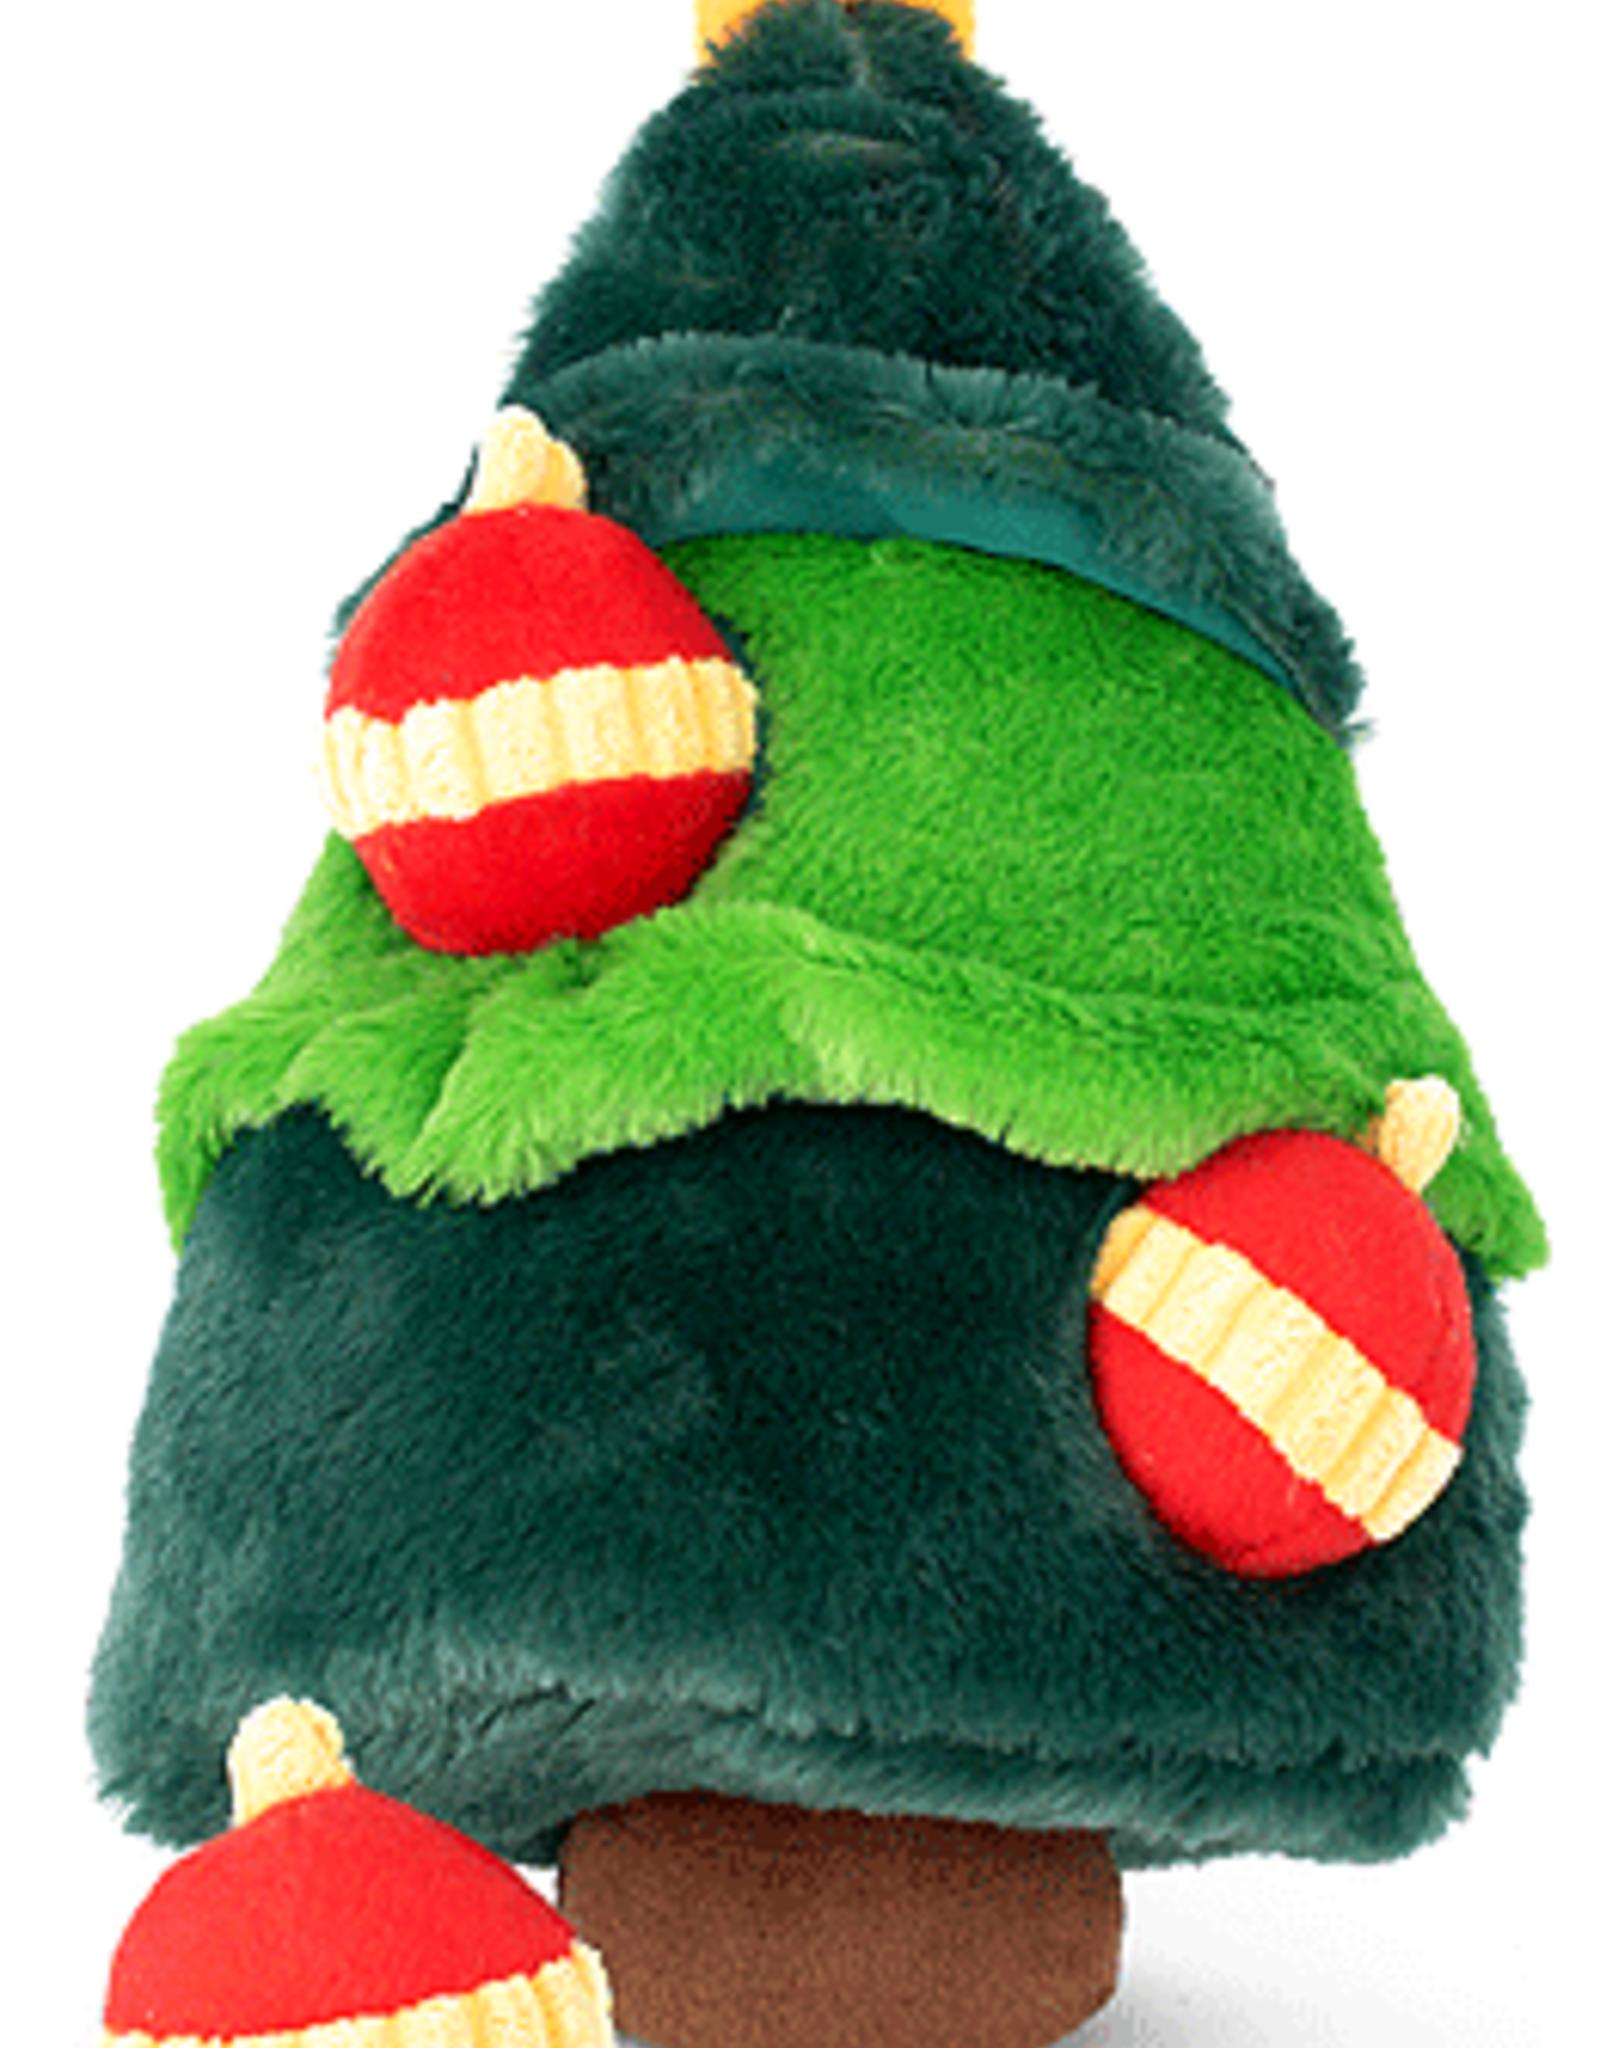 ZippyPaws ZippyPaws Holiday Burrow - Christmas Tree